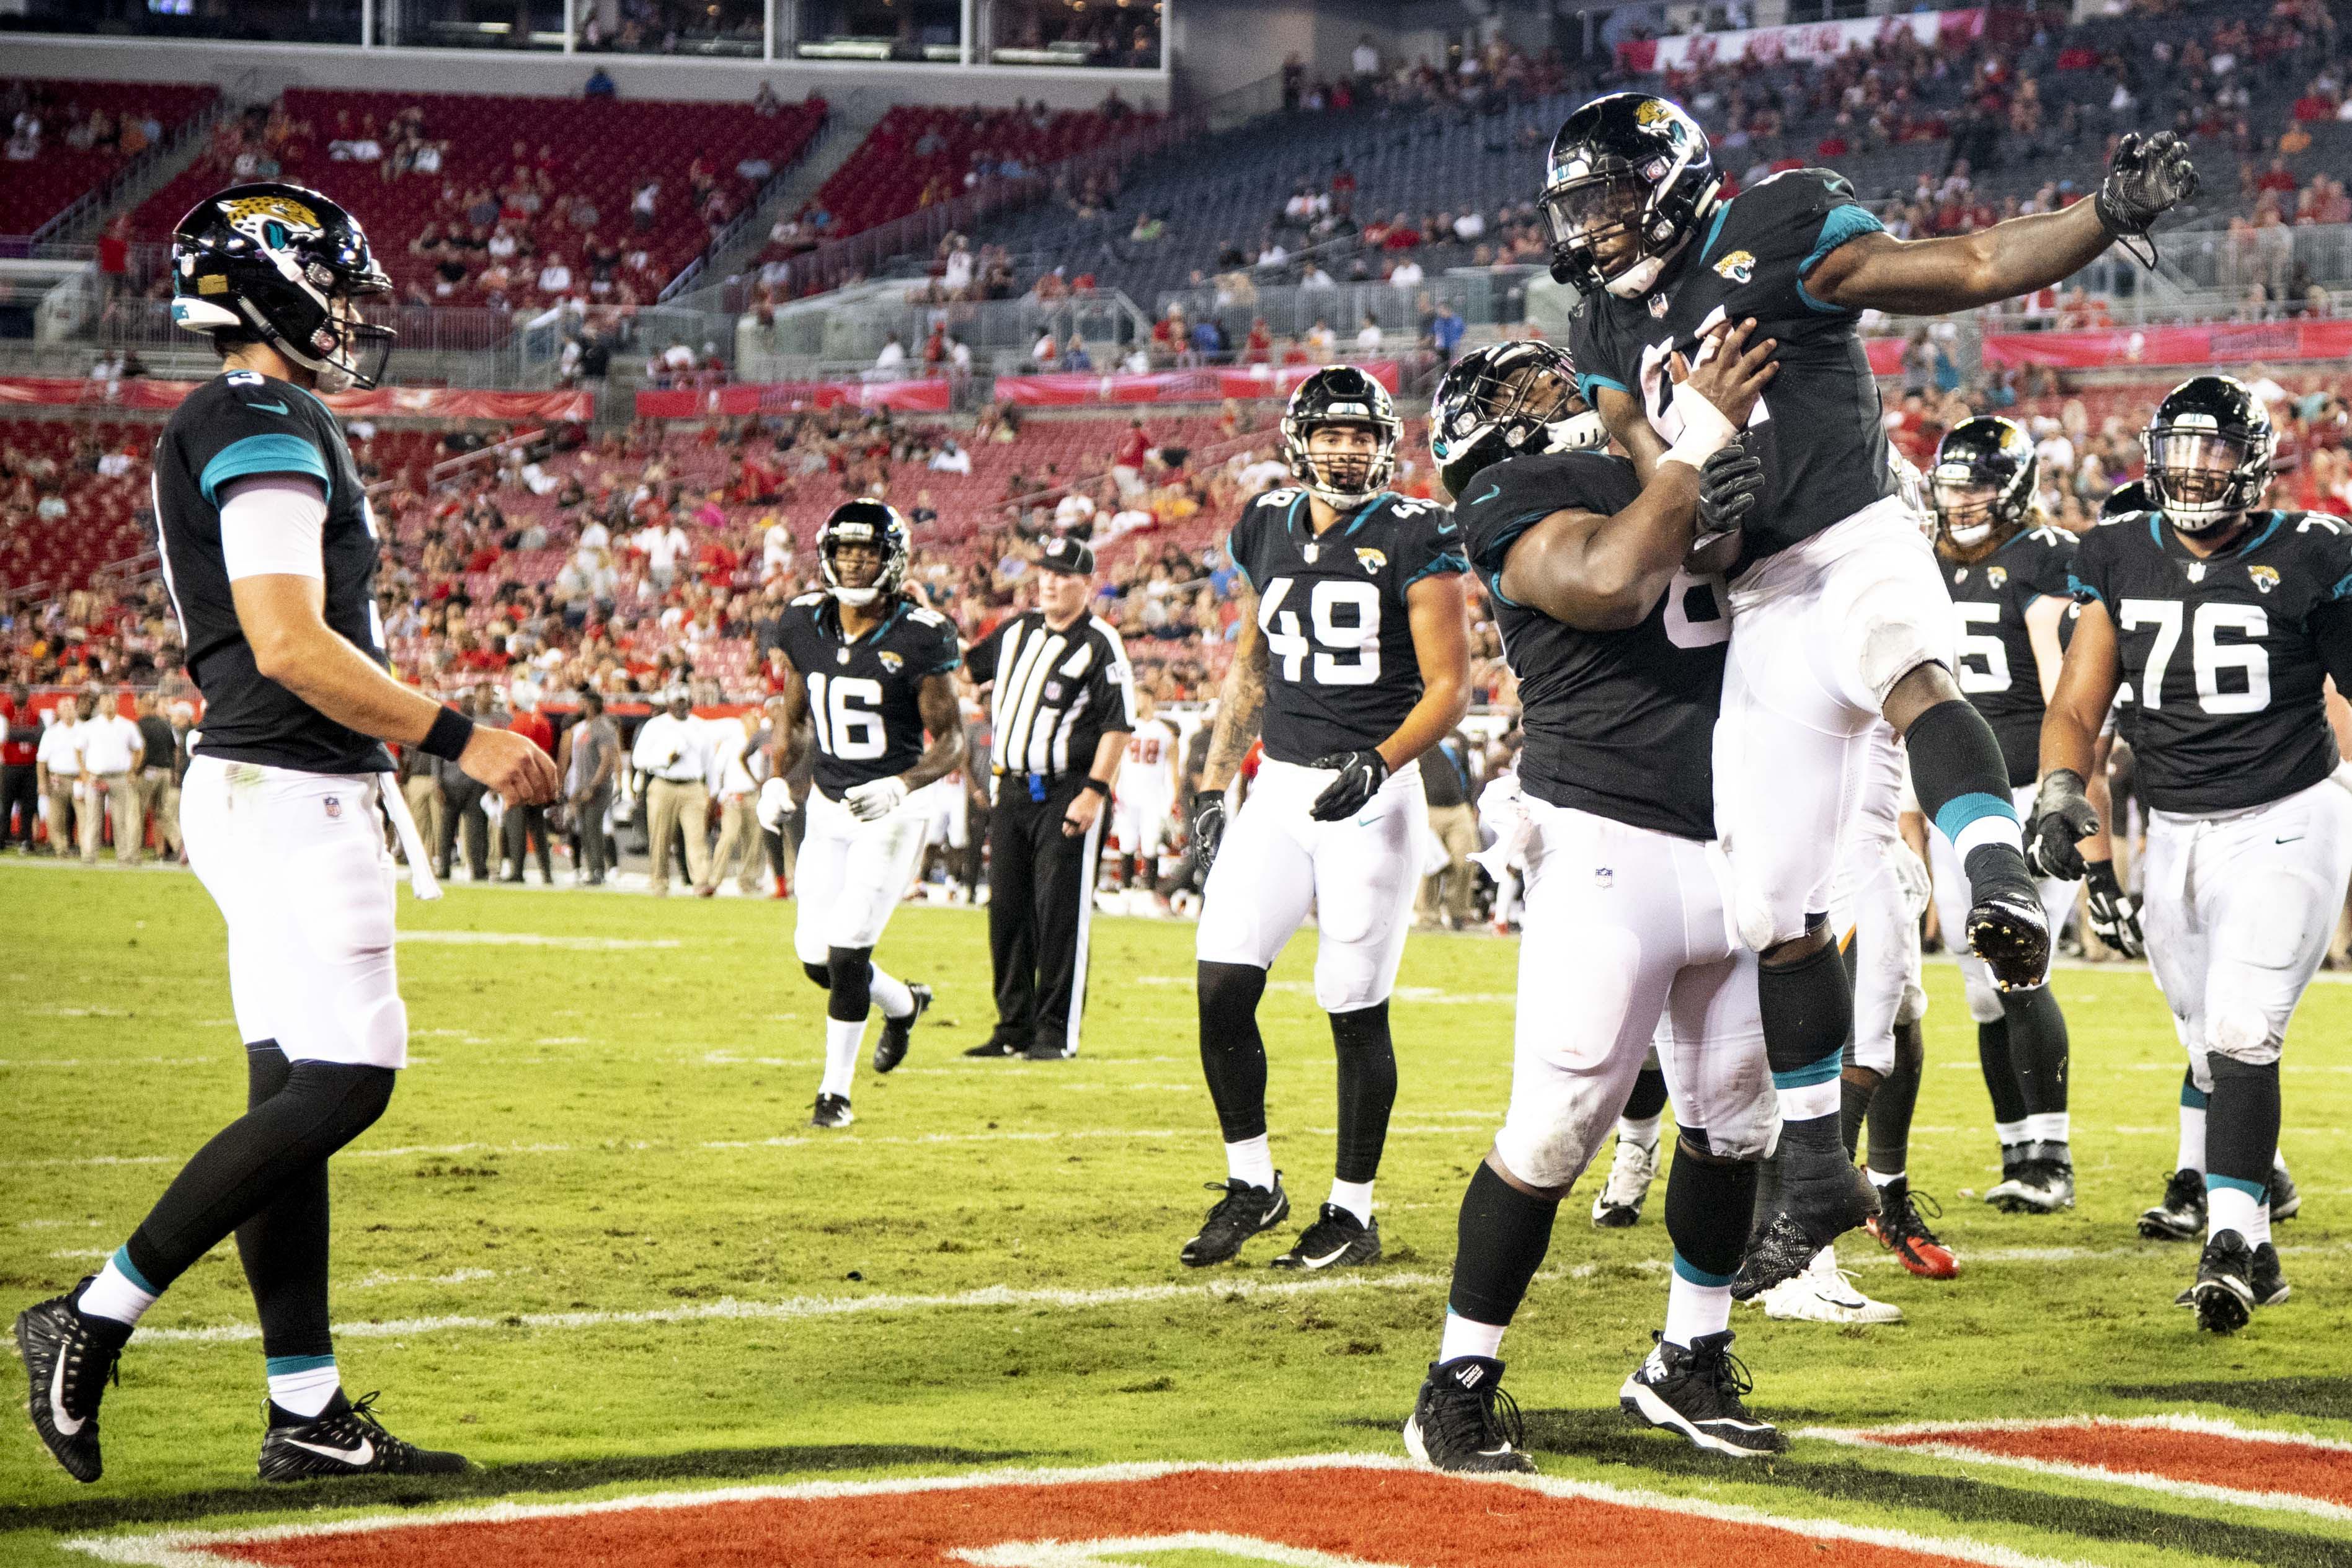 NFL: Jacksonville Jaguars at Tampa Bay Buccaneers